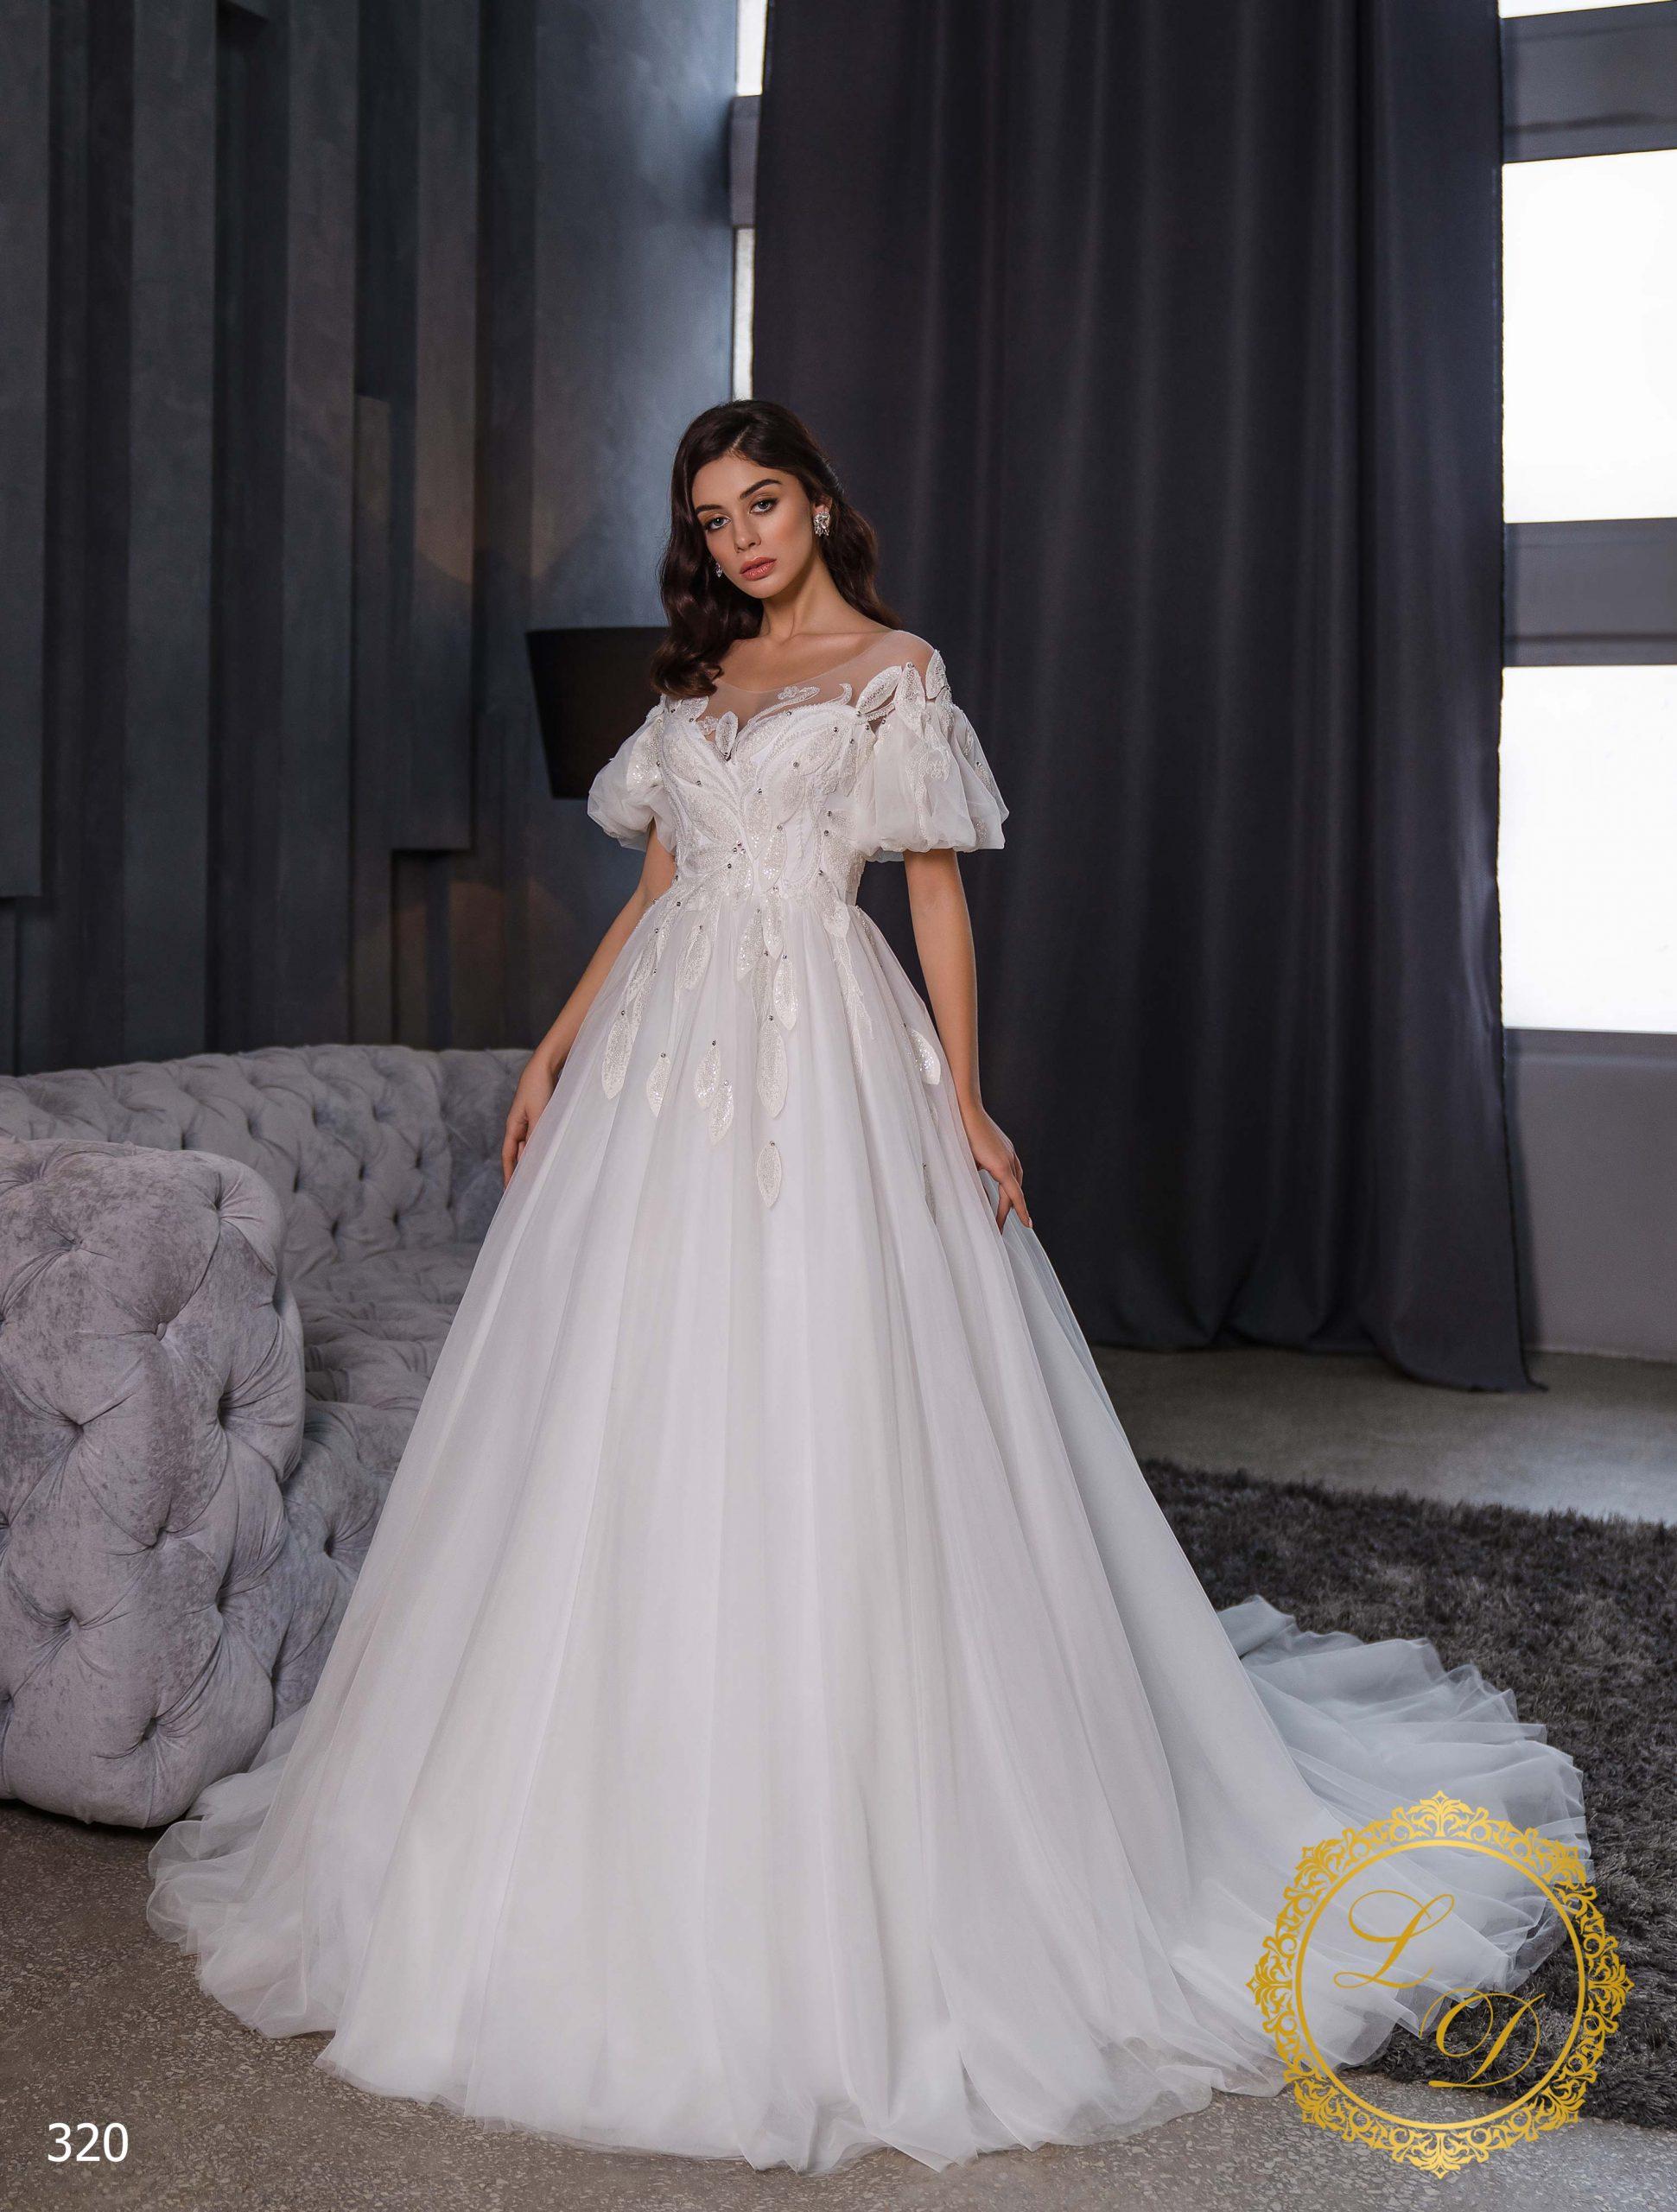 Wedding Dress Lady Di 320-1